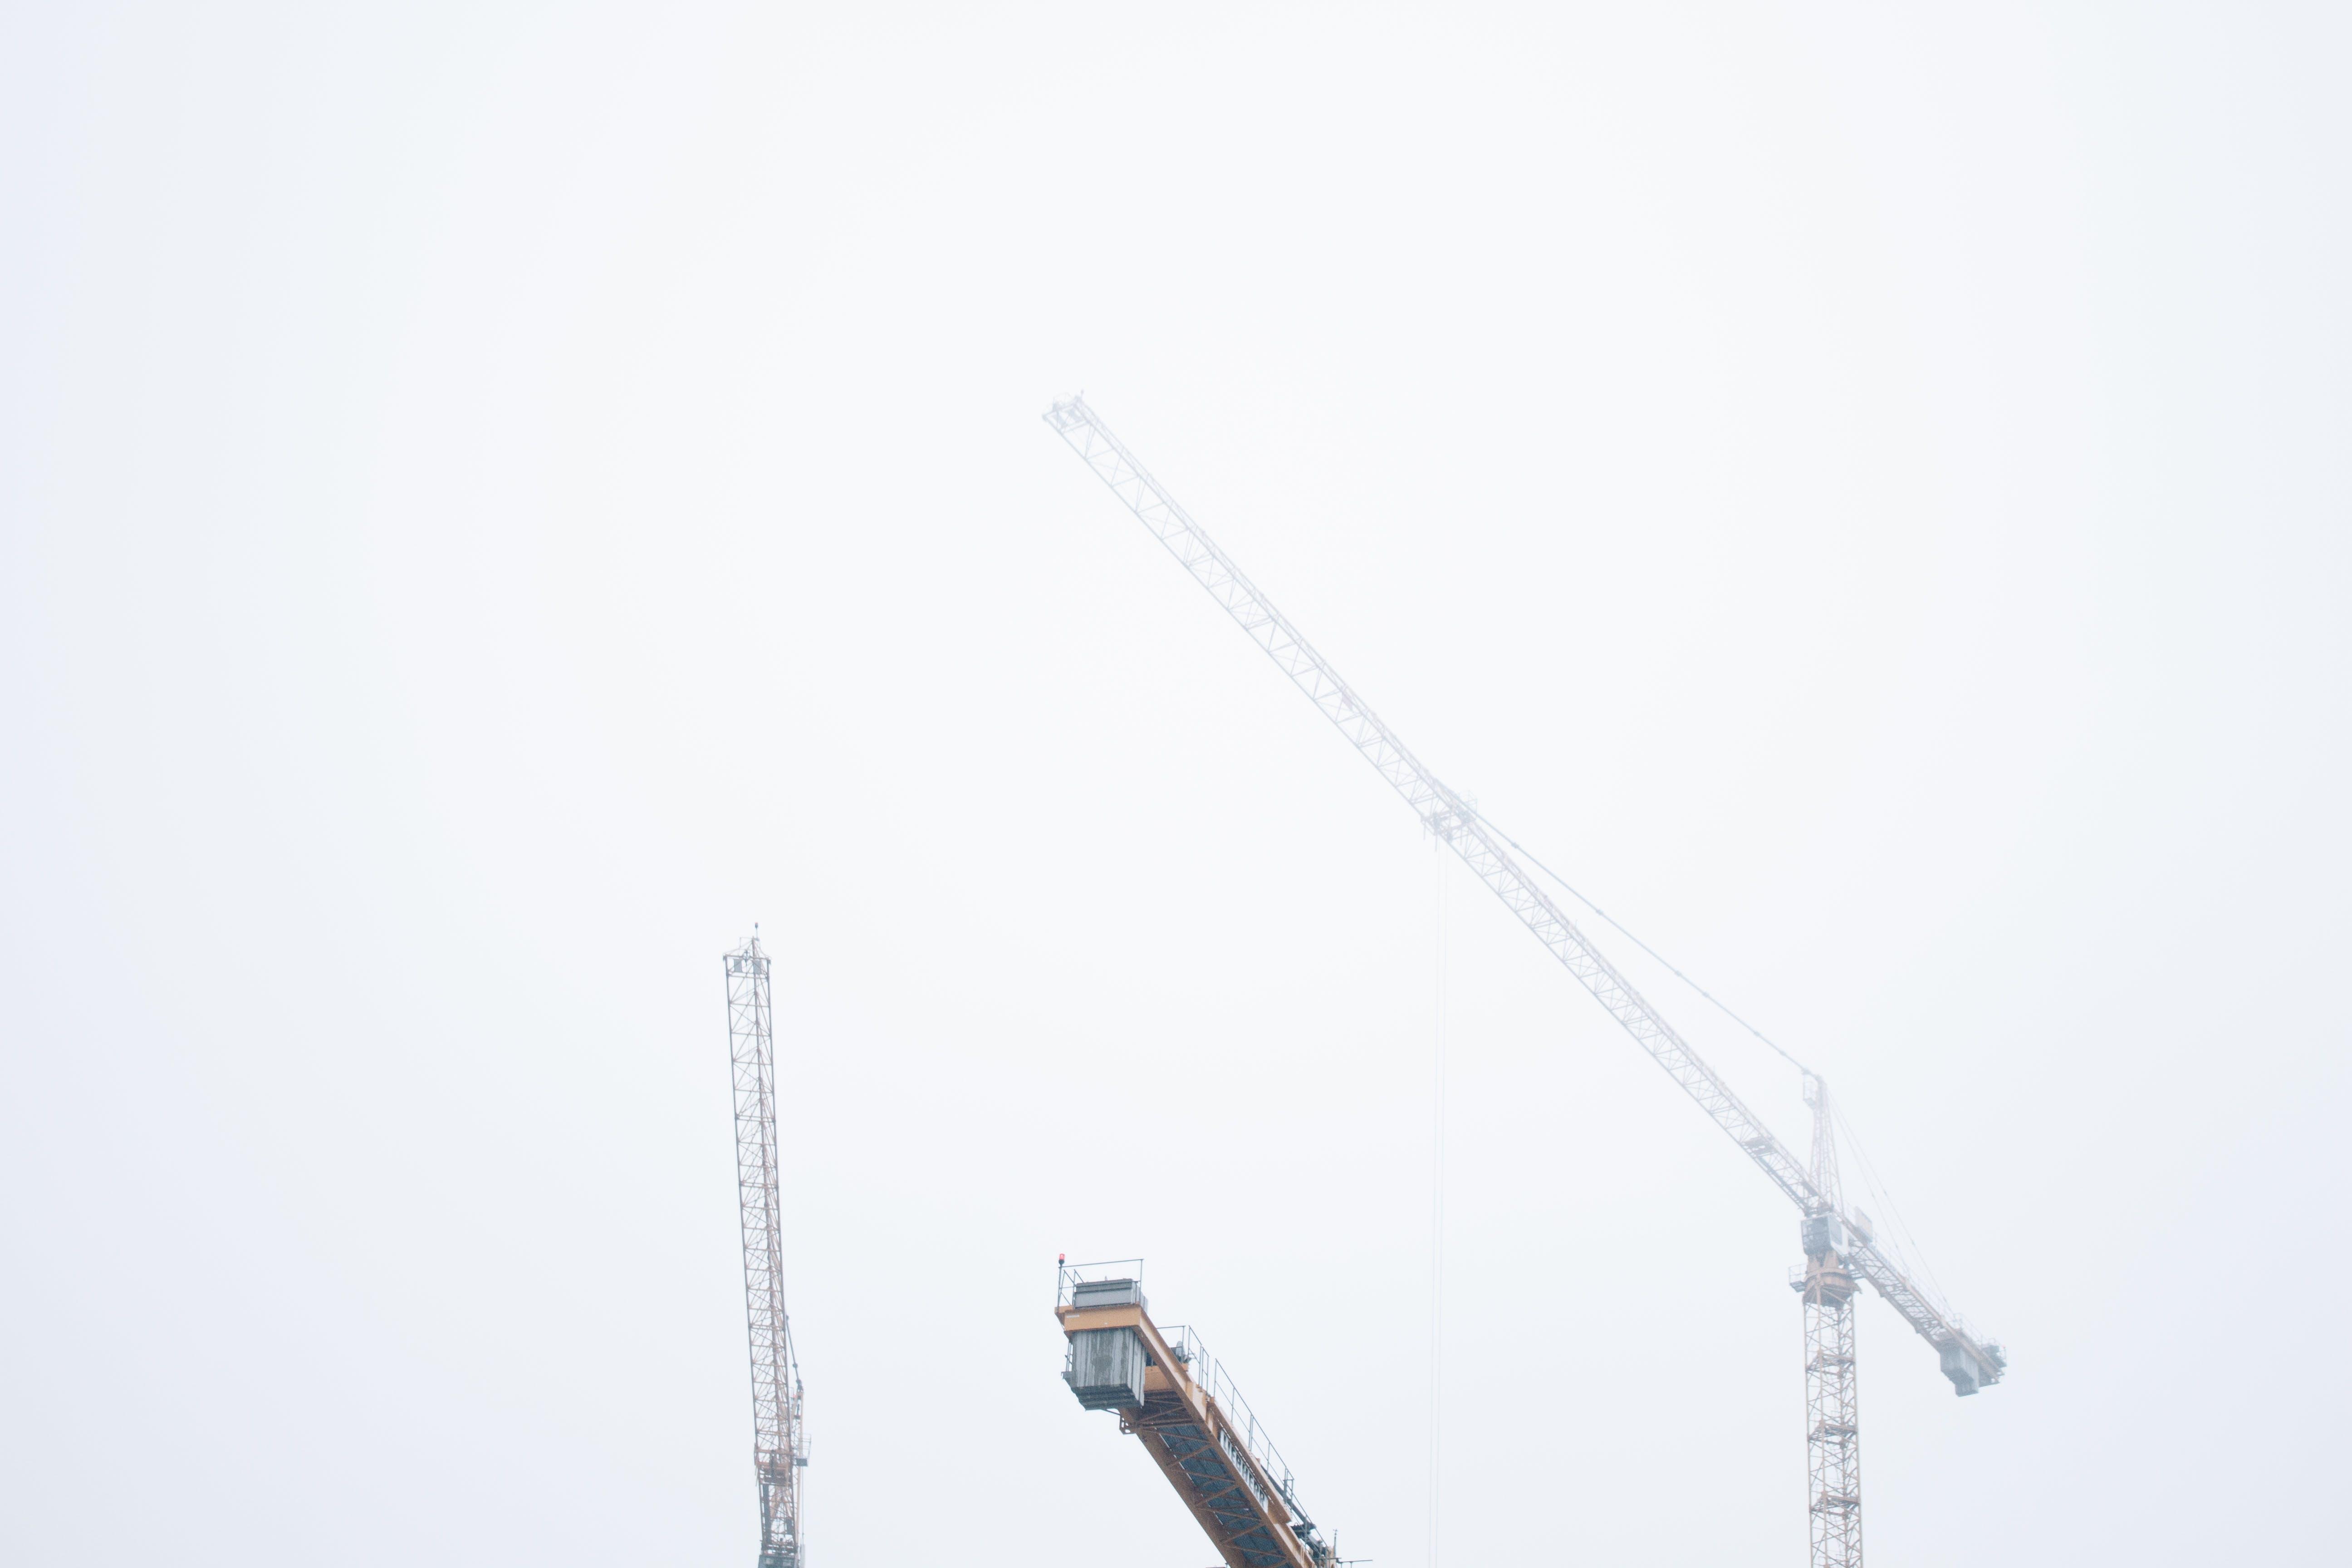 construction, crane arm, cranes